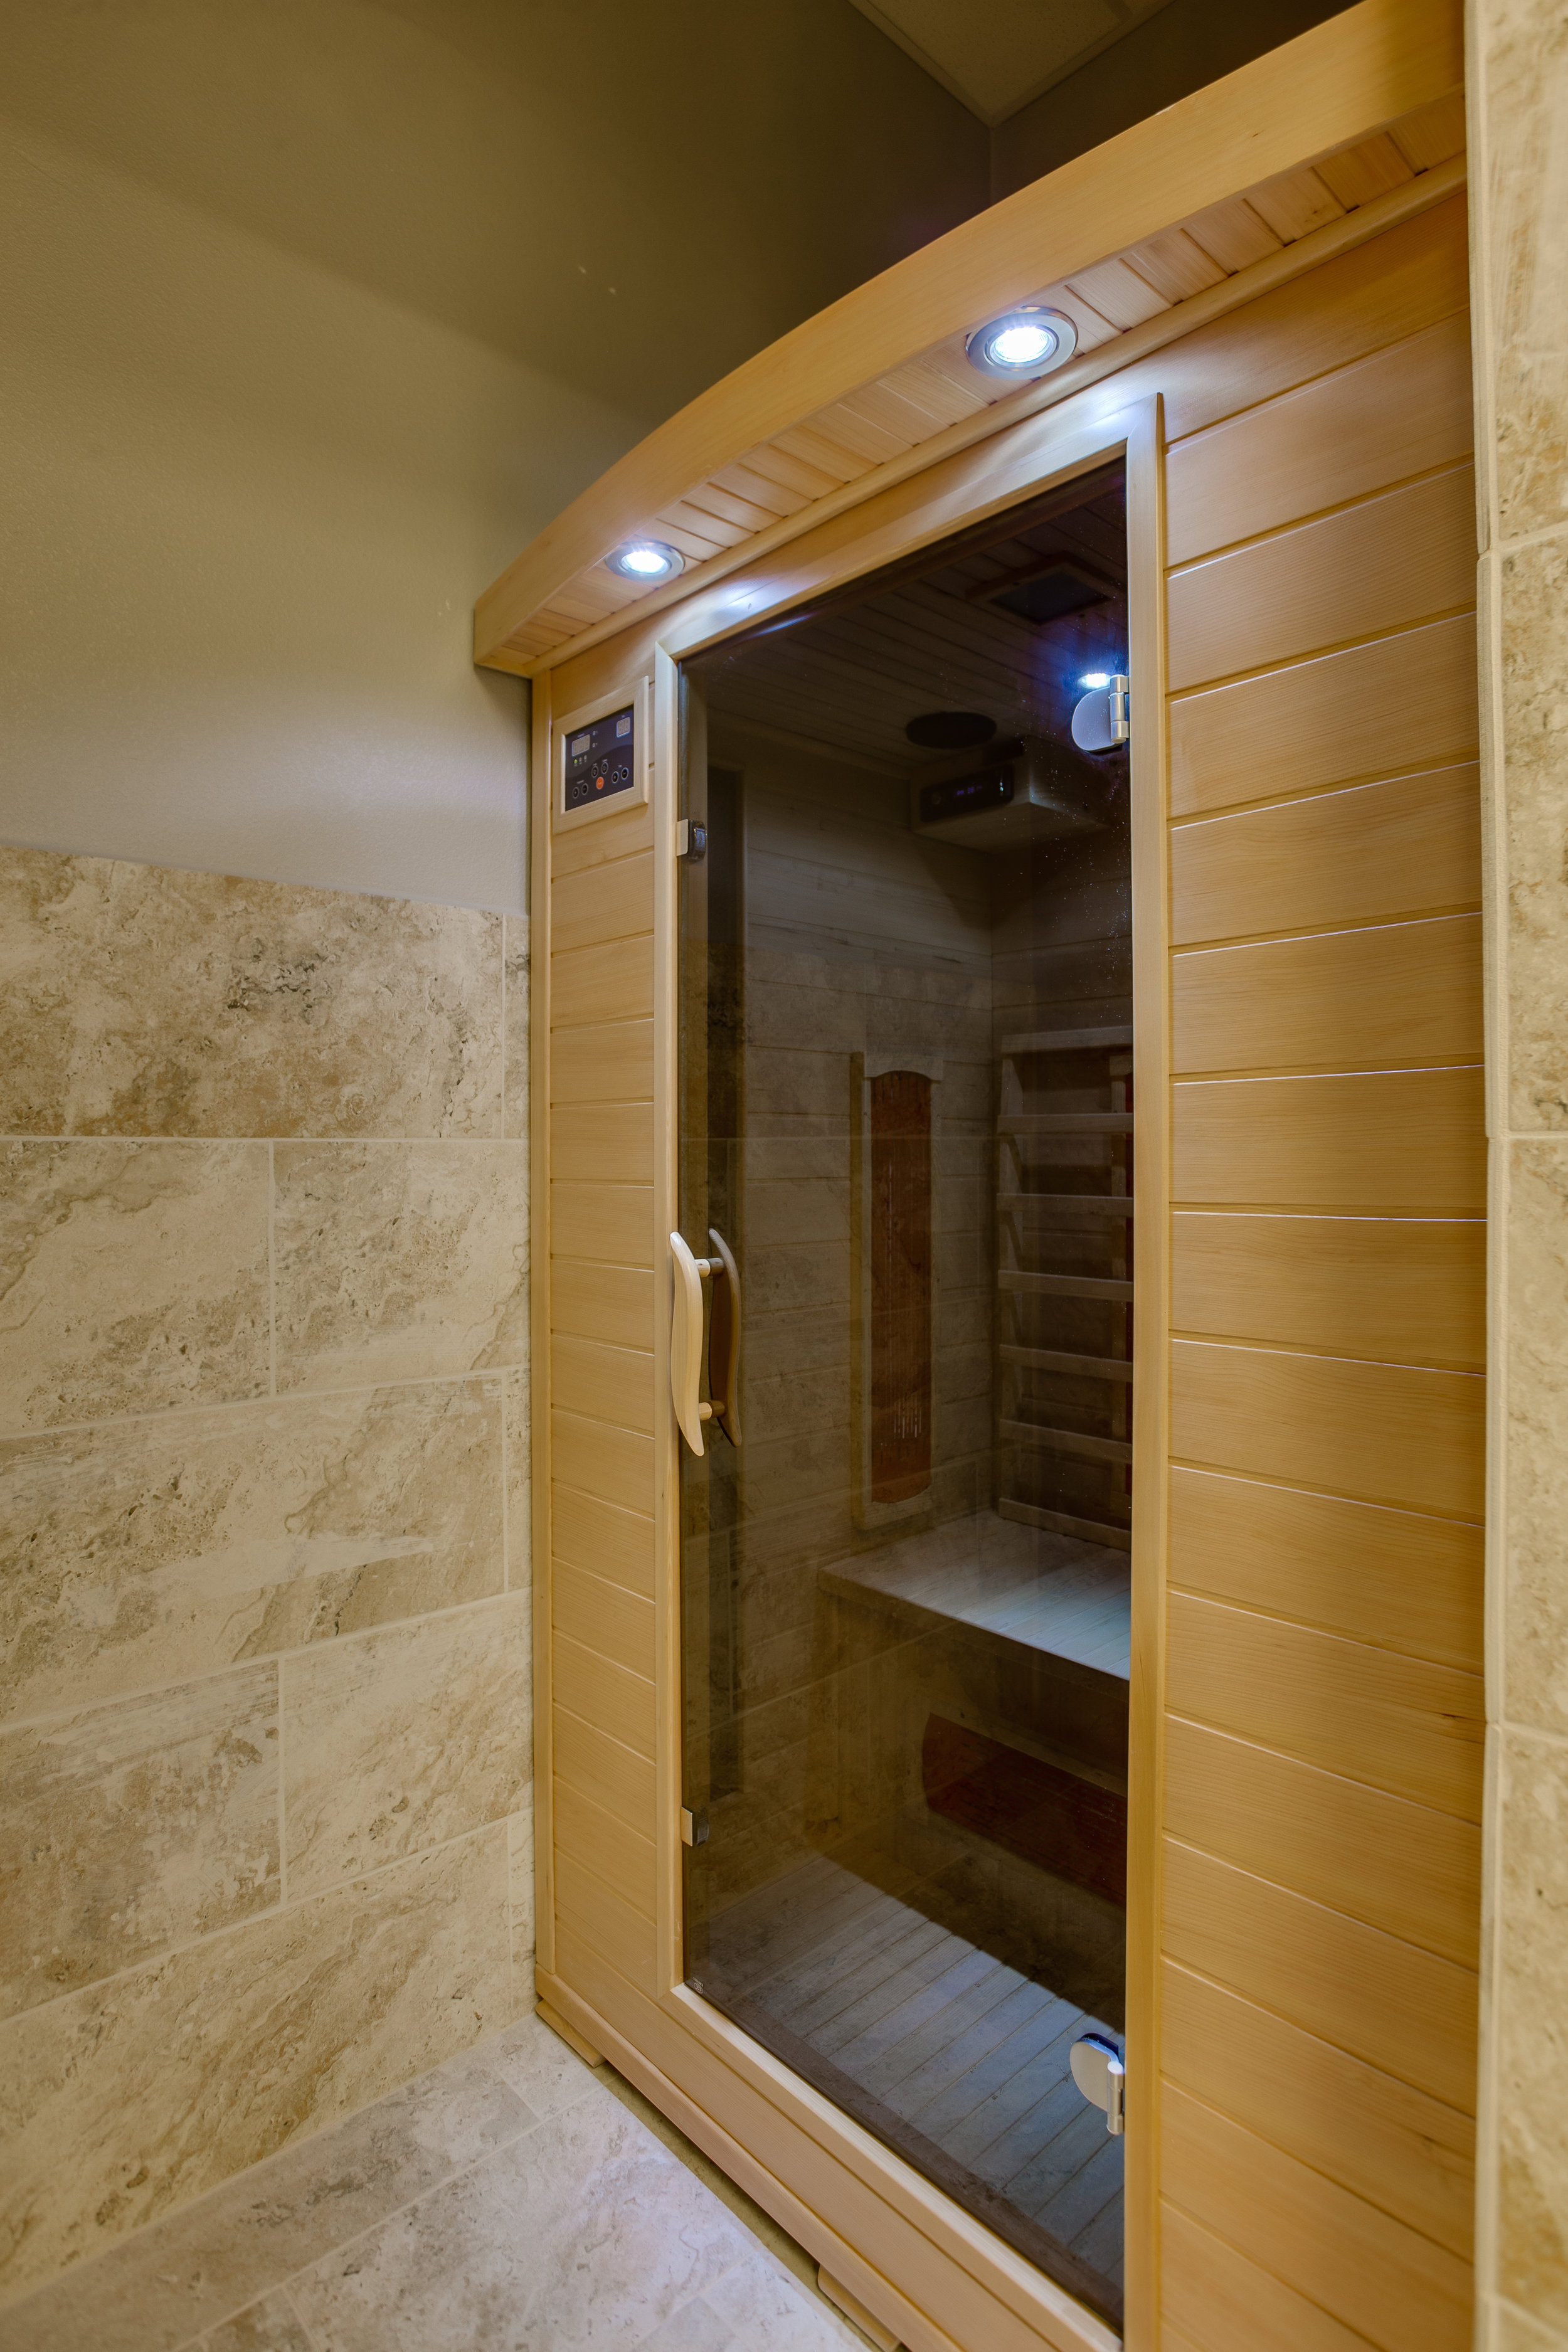 Enjoy our sauna after your workout